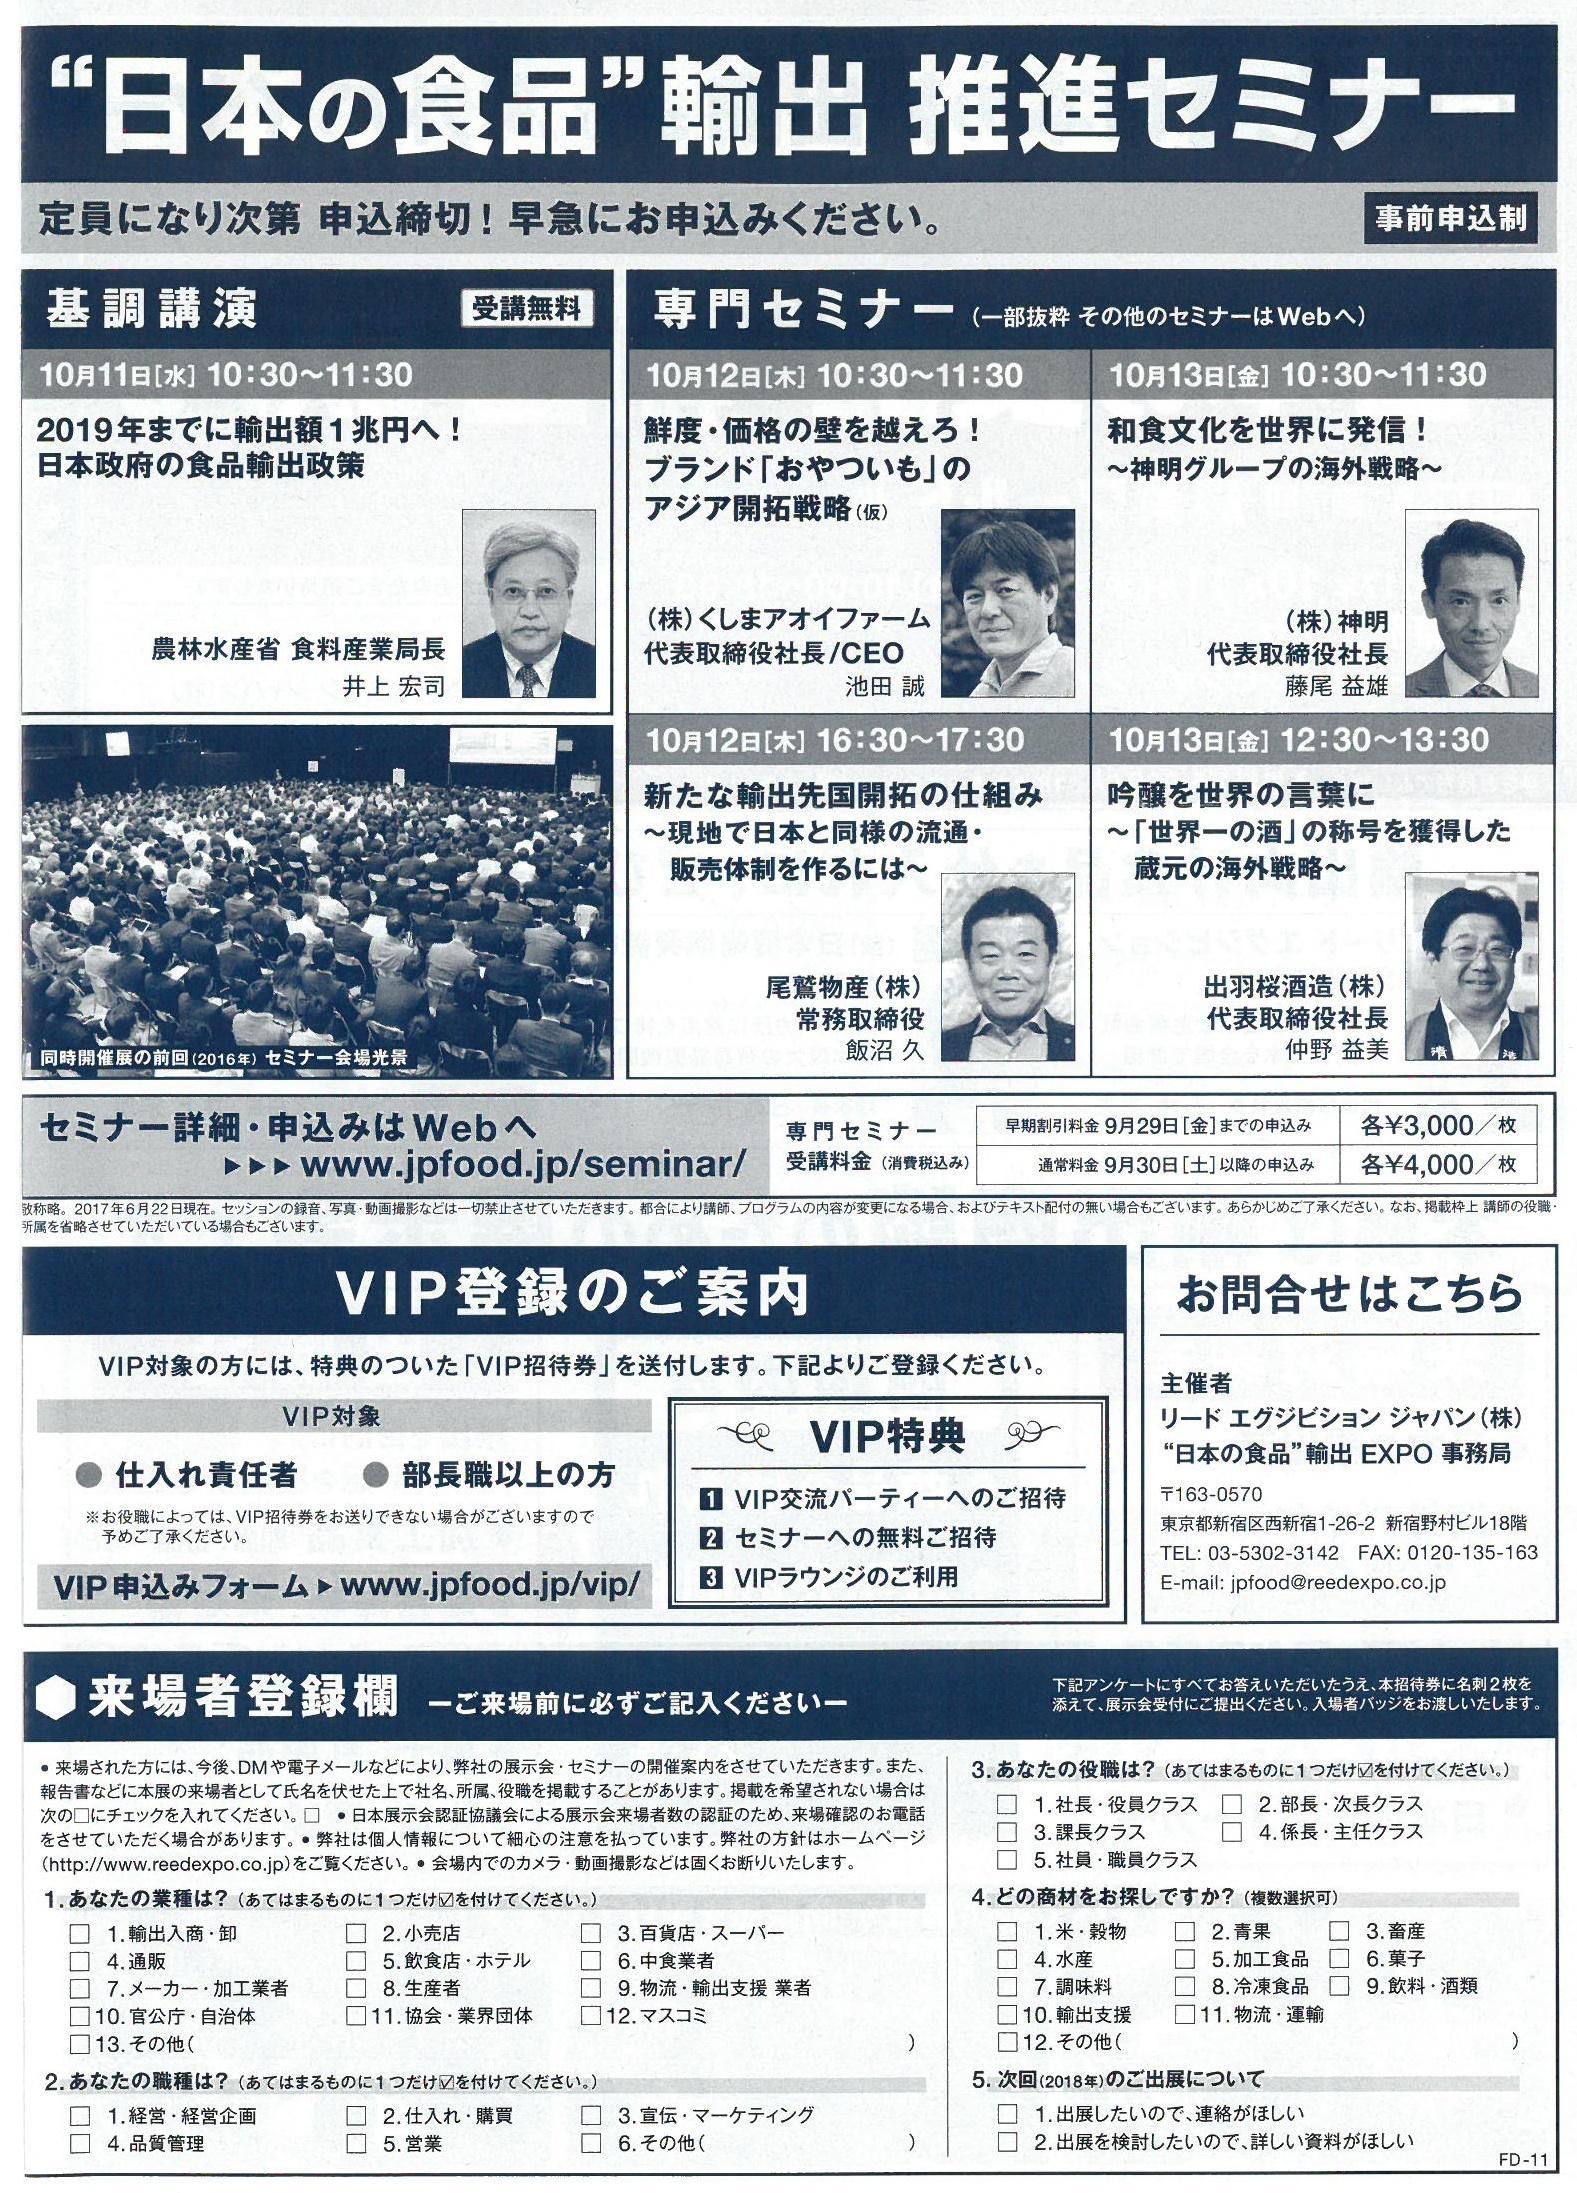 news-20170914-3.jpg